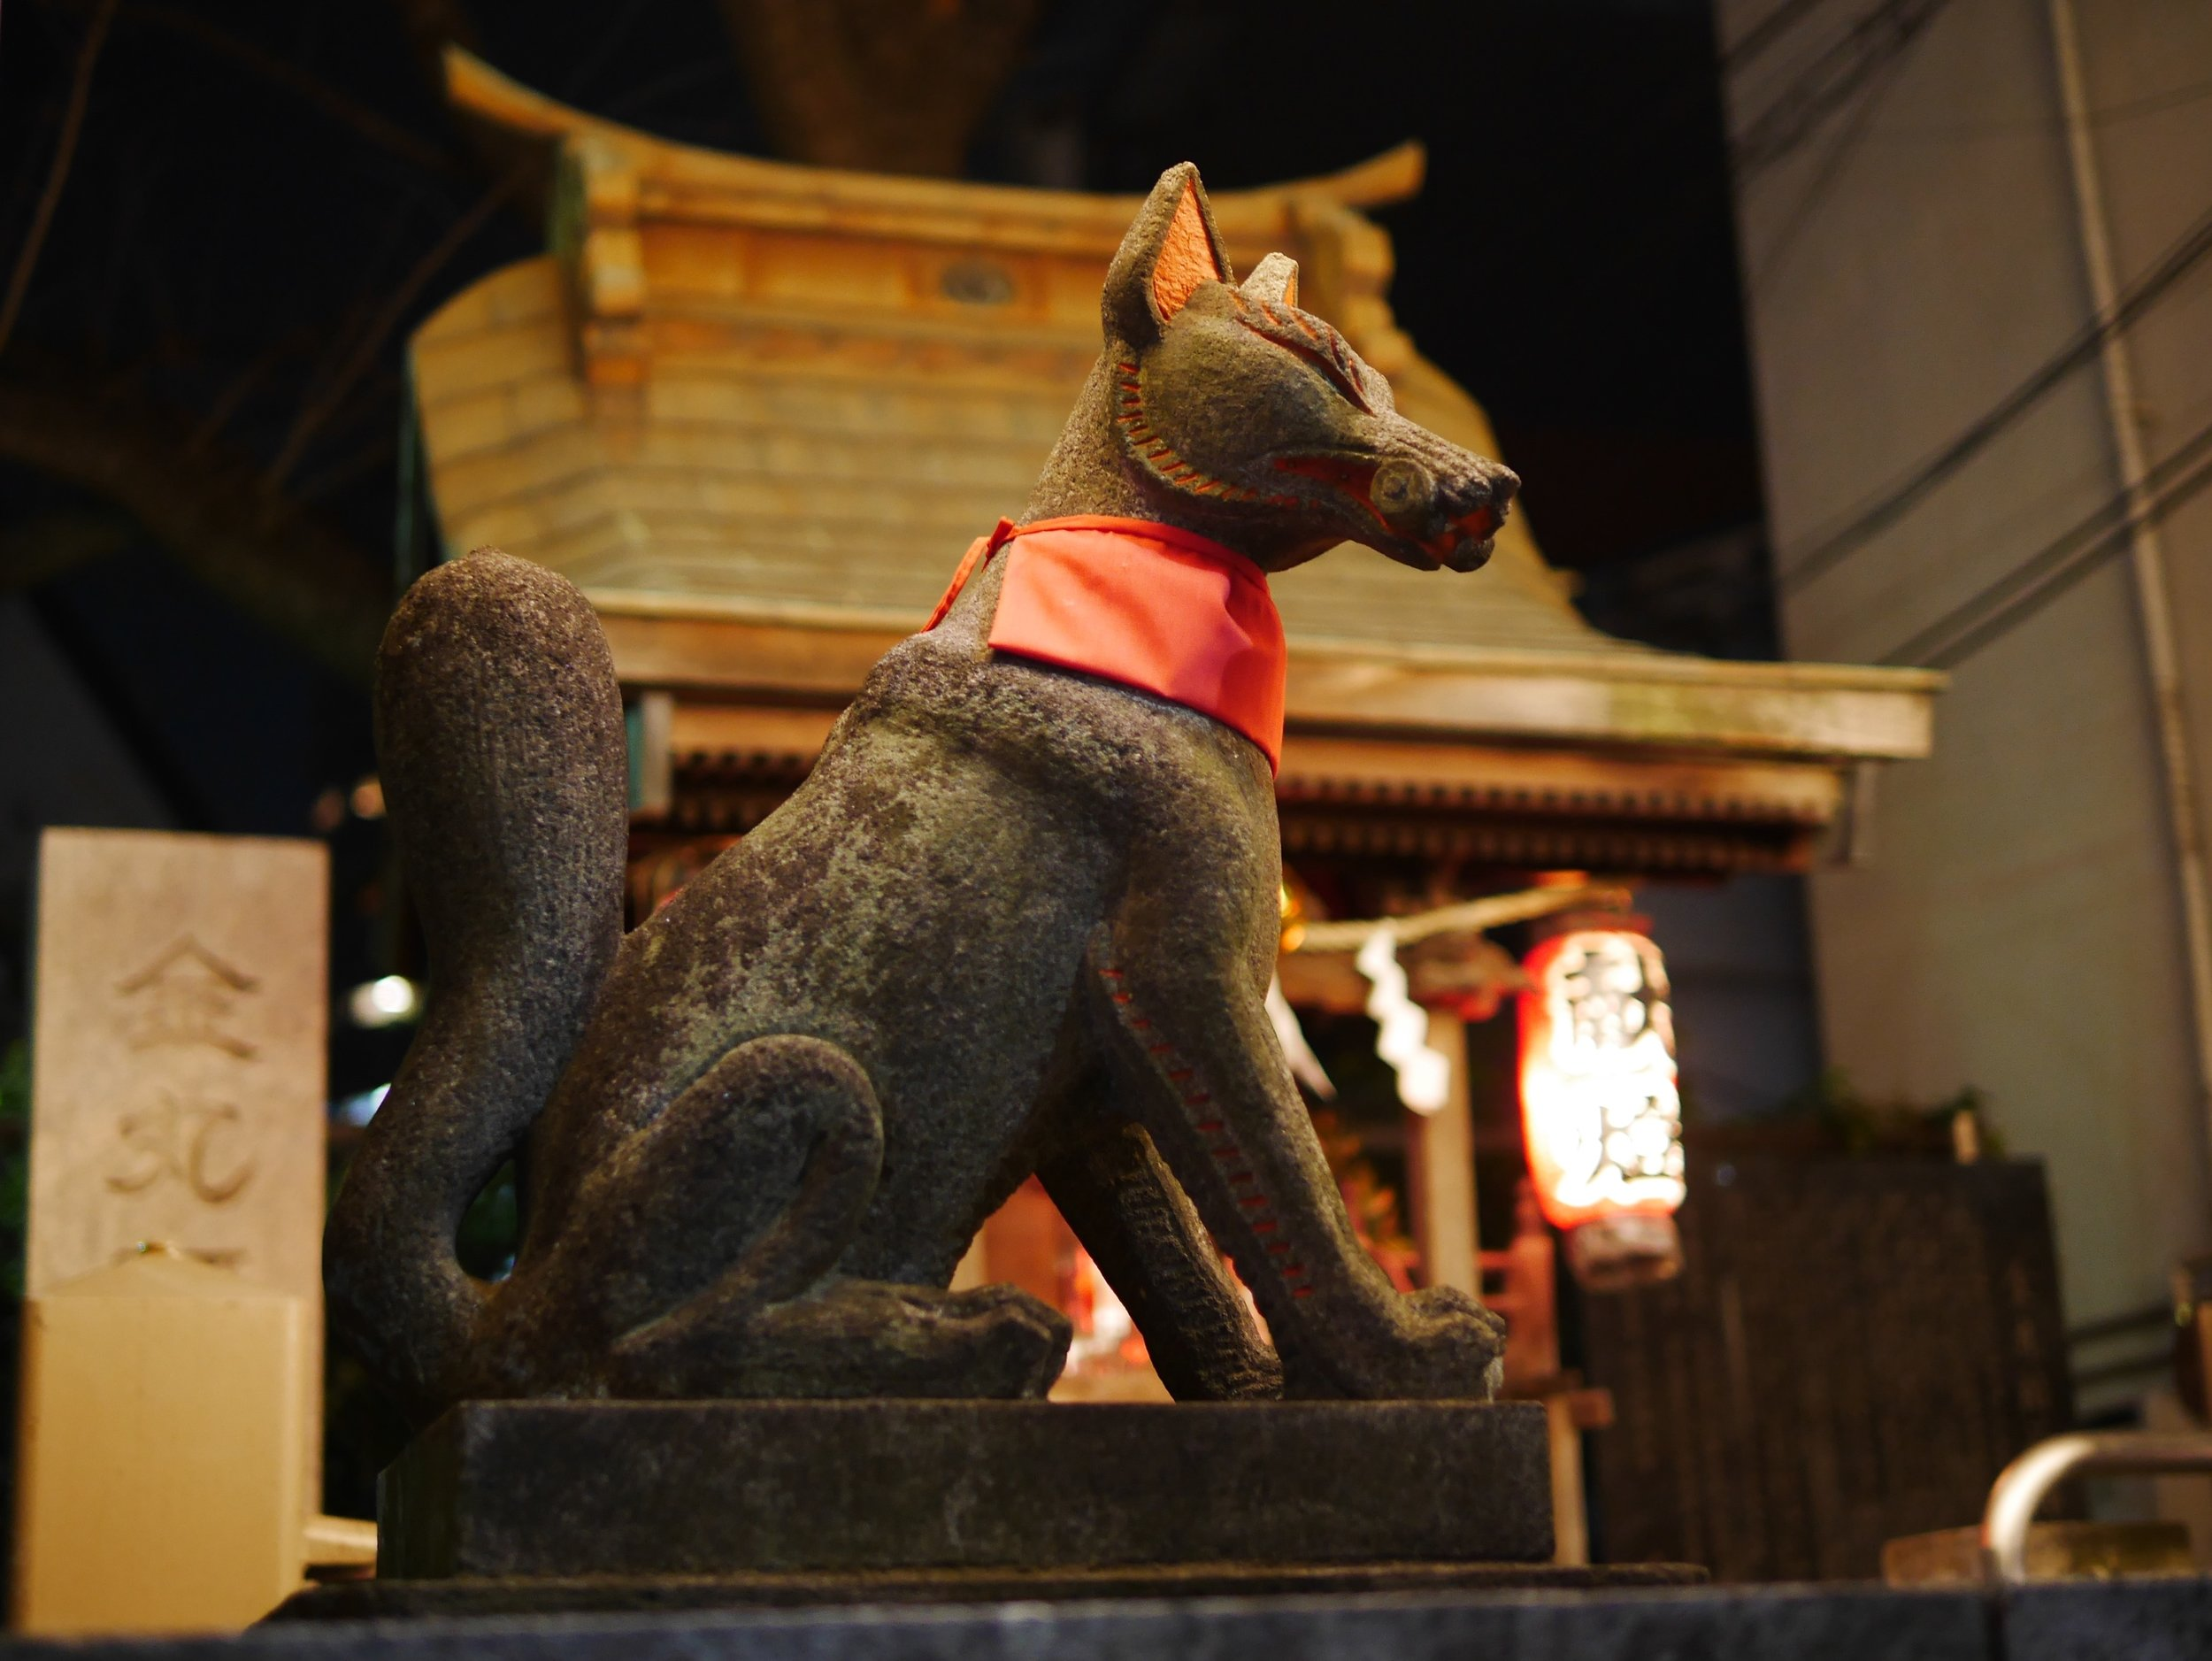 The Kanemaruinari Shrine, located in the heart of Arakicho